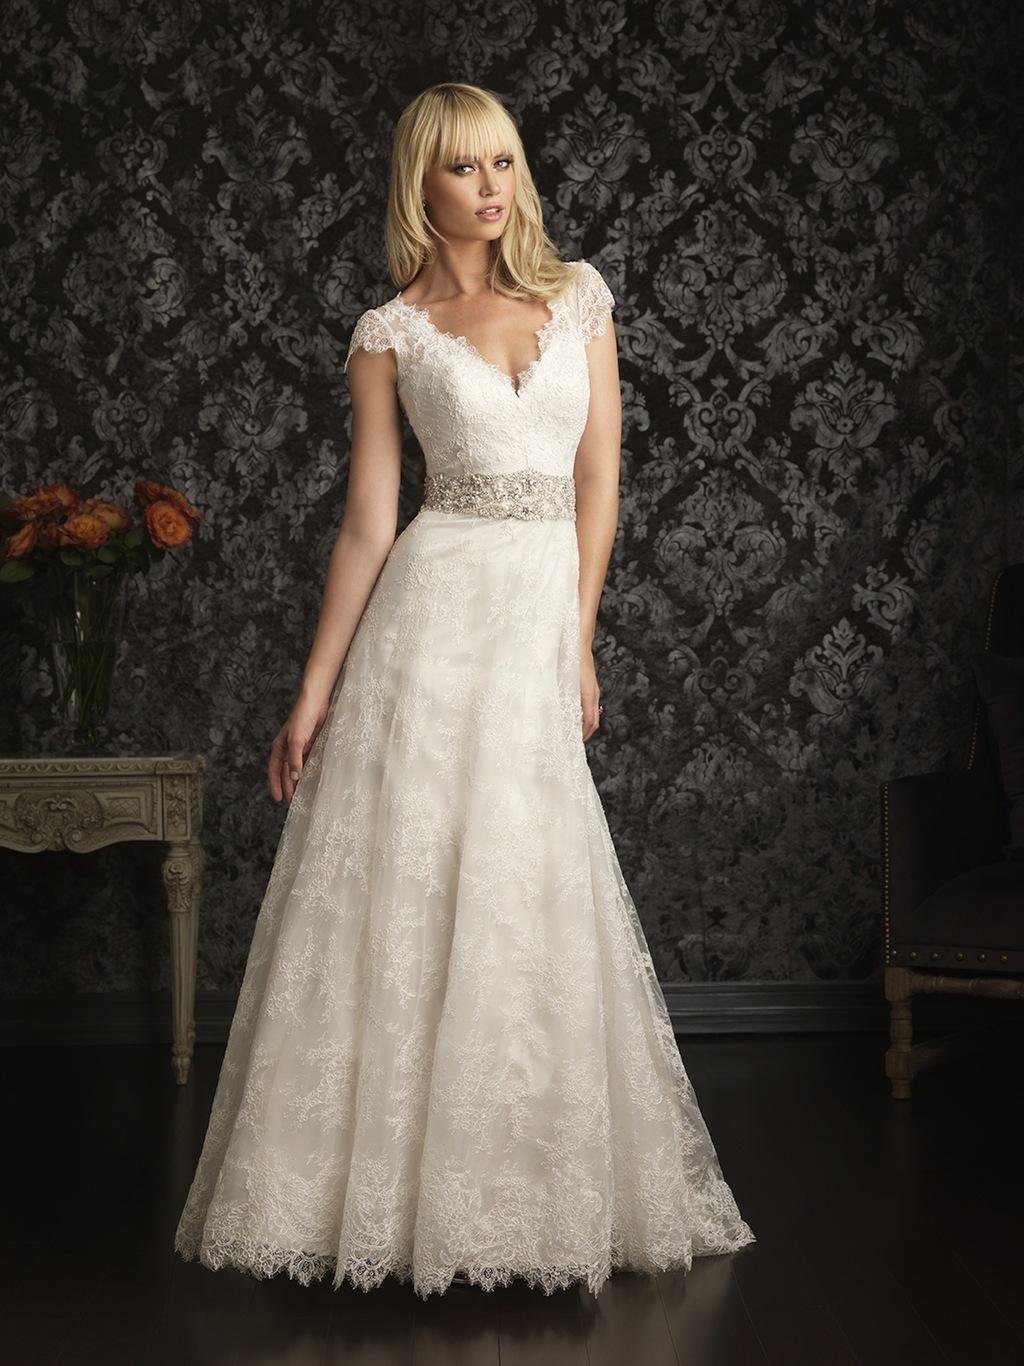 Allure Wedding Gowns 003 - Allure Wedding Gowns